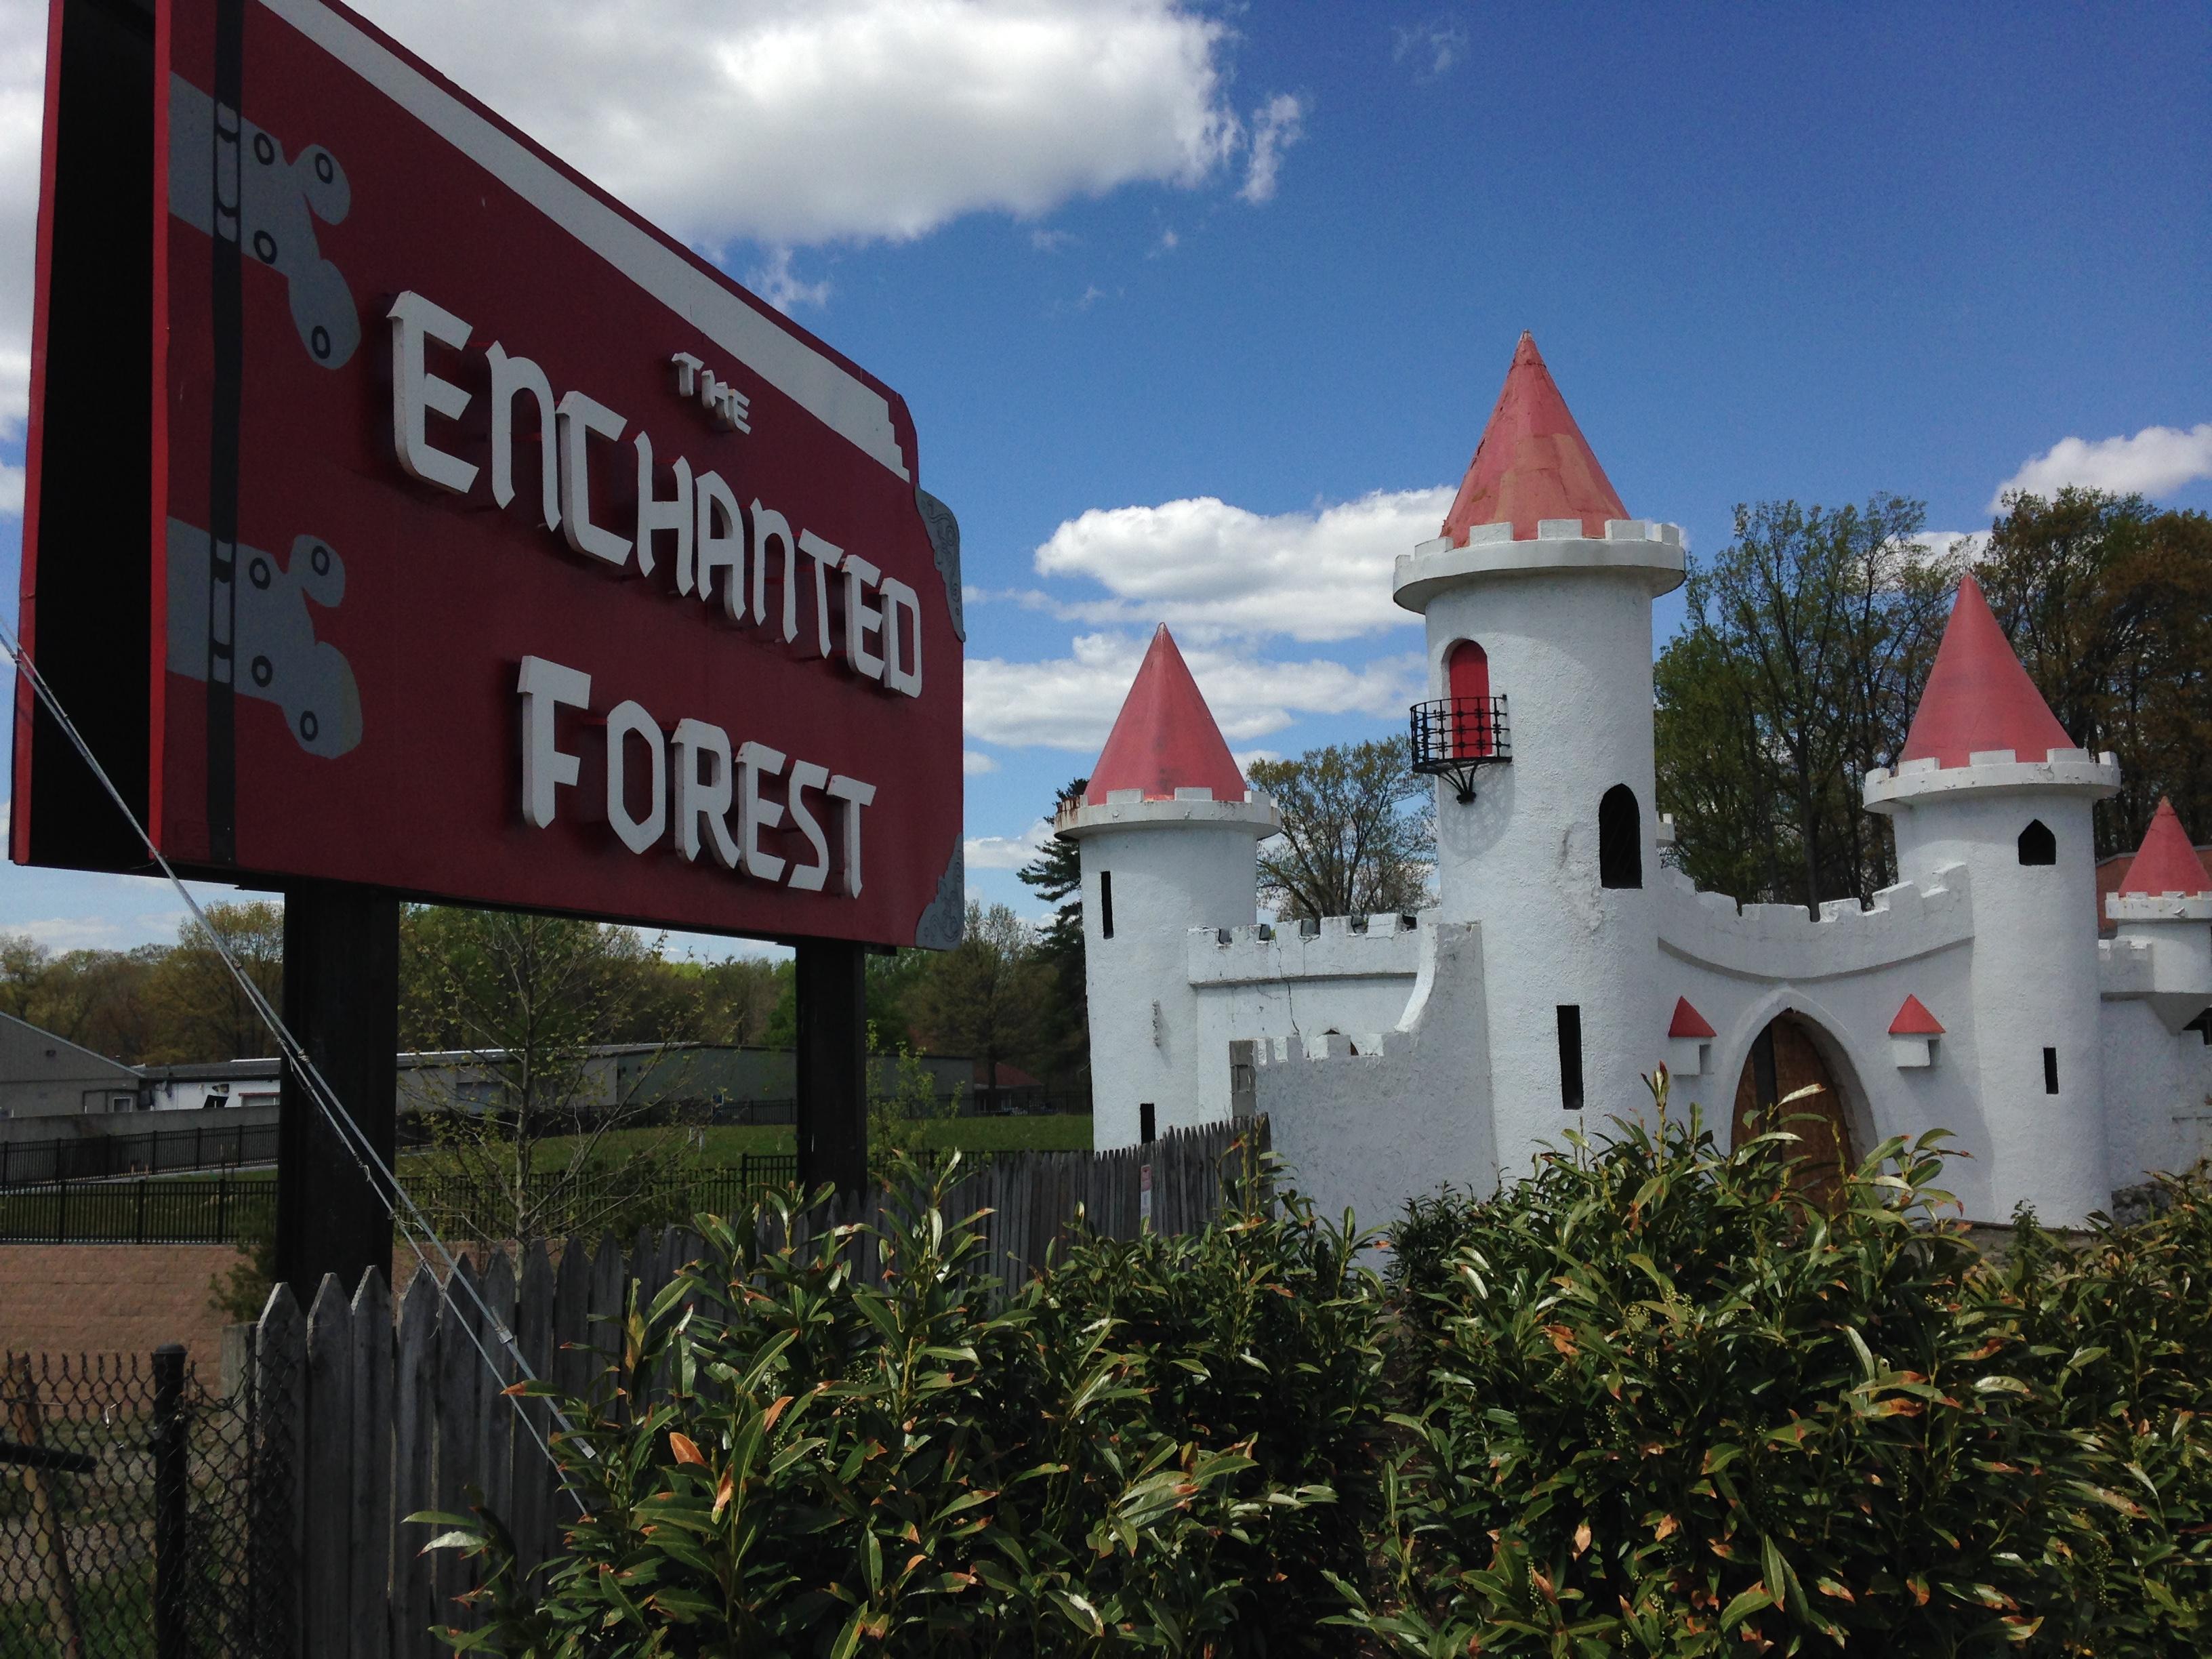 Enchanted Forest Ellicott City Shopping Center